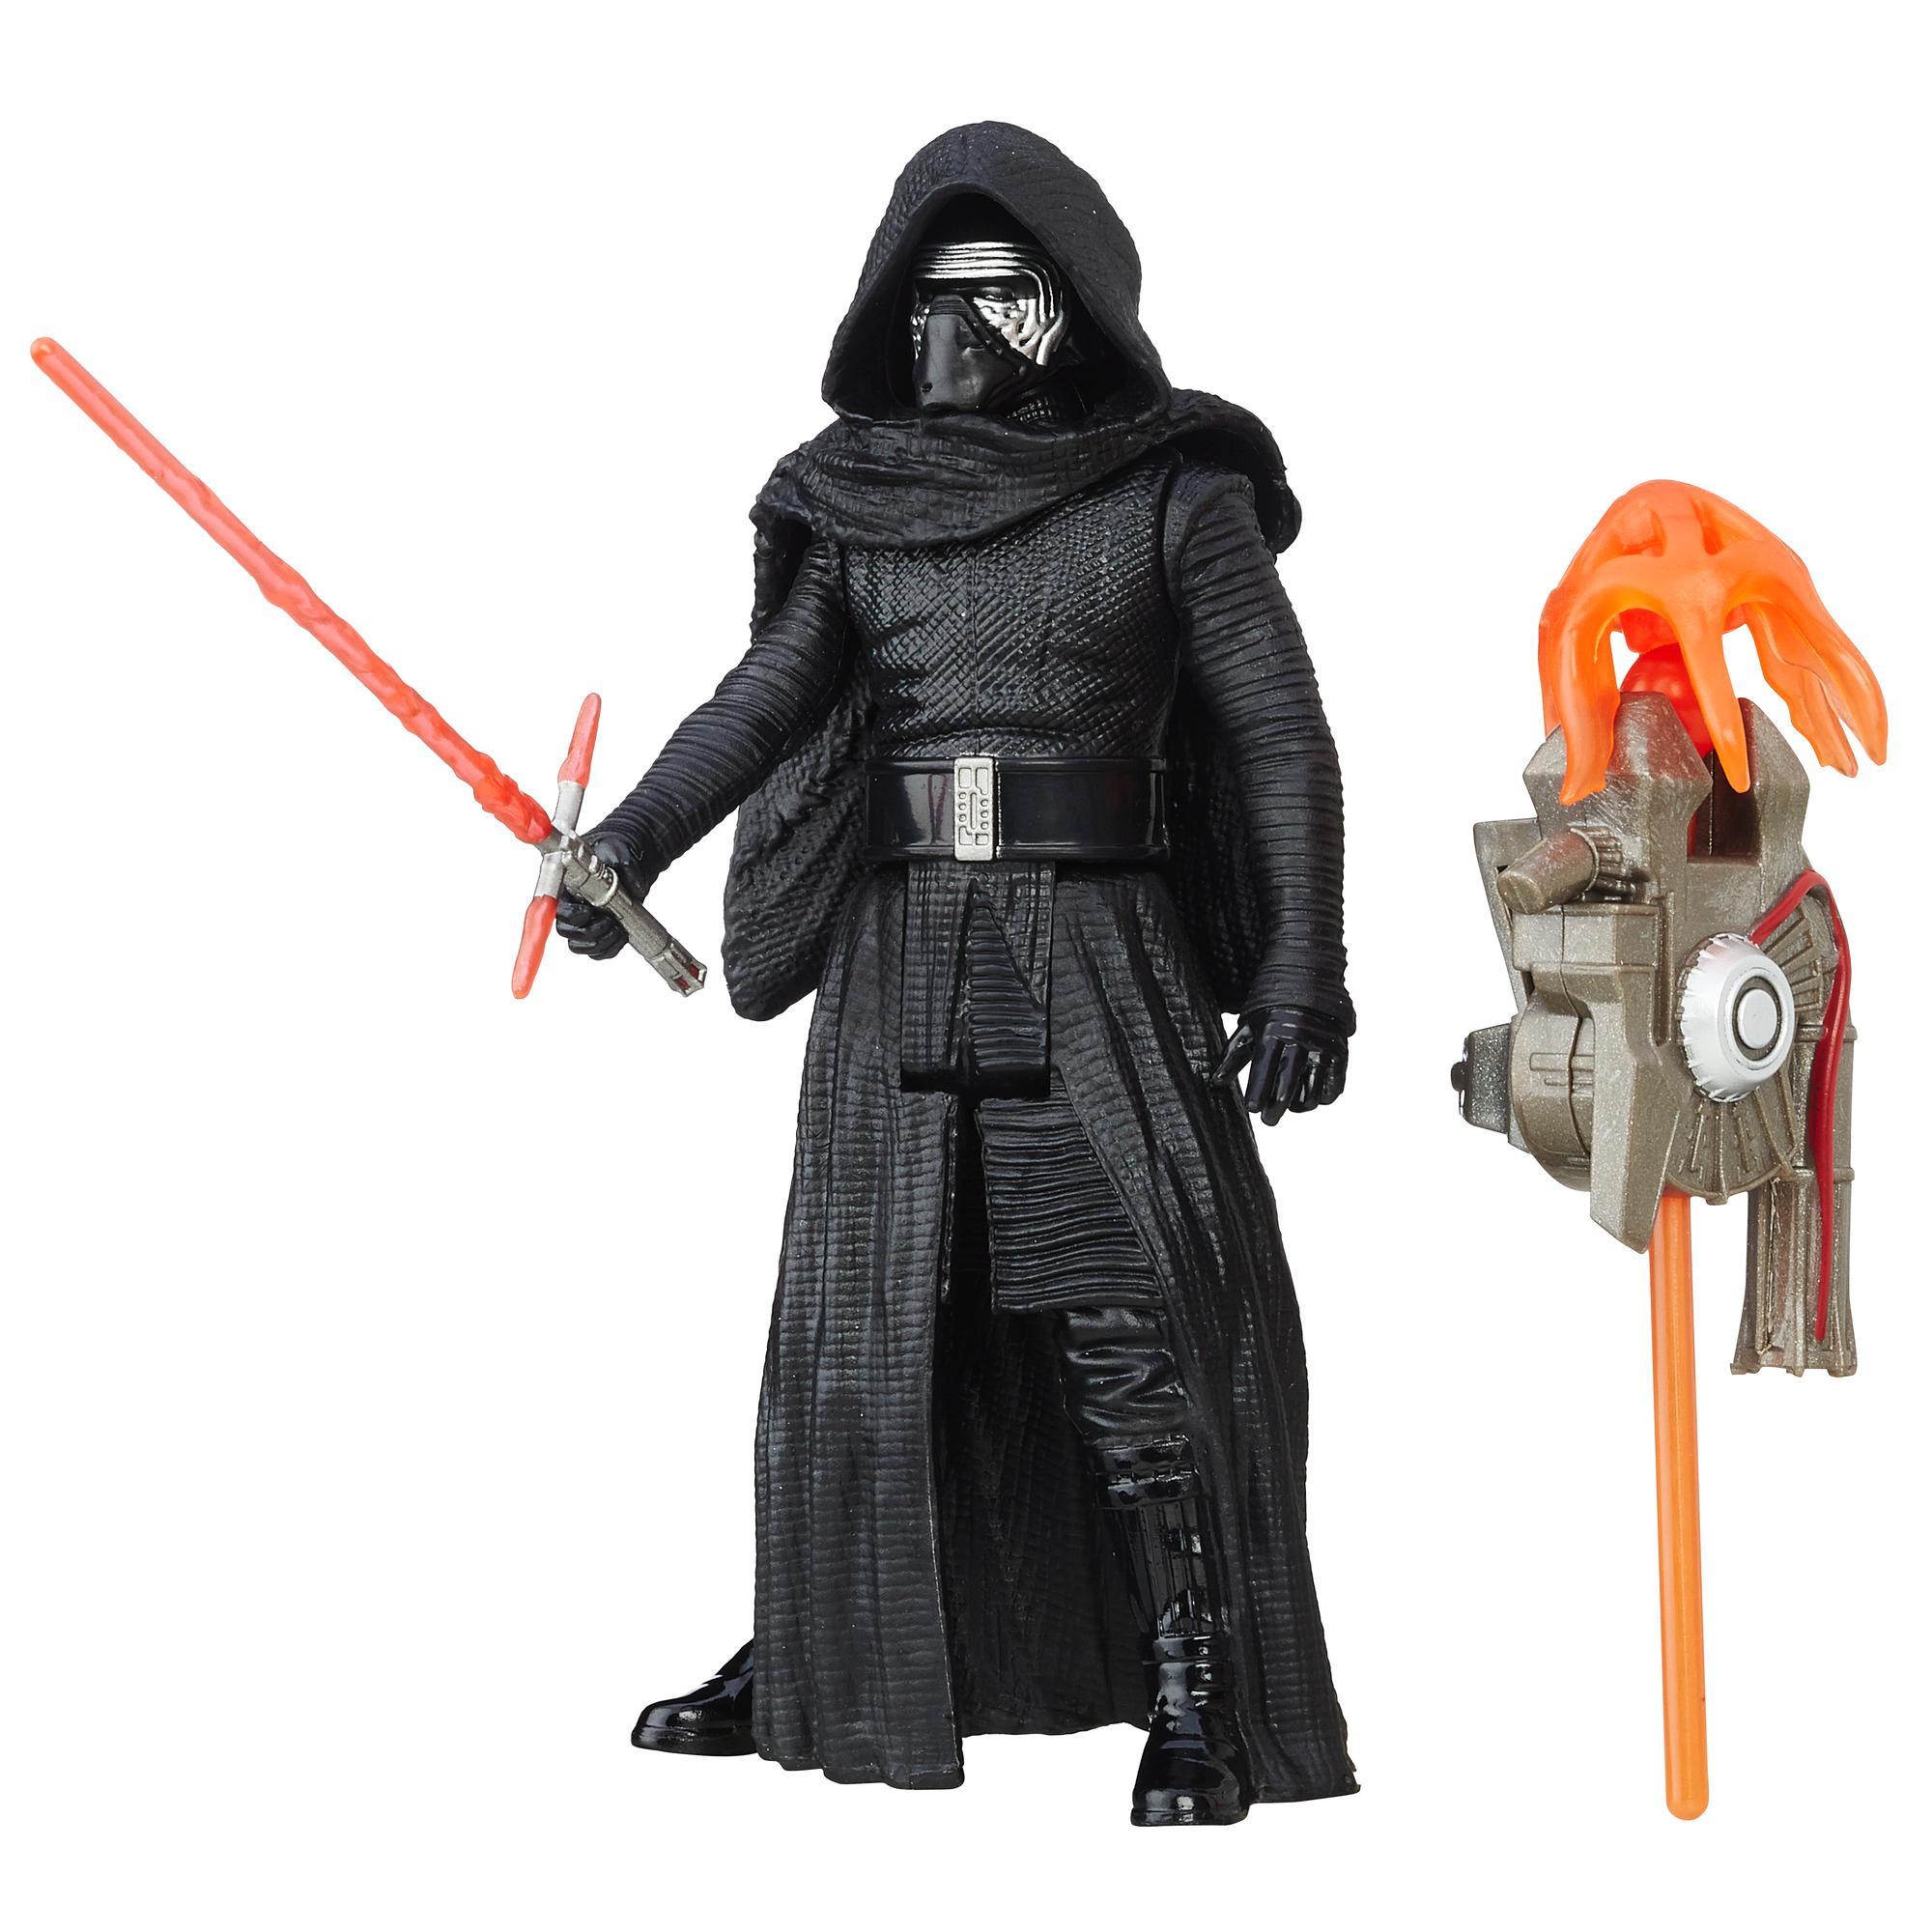 Figura Star Wars: O Despertar da Força - Kylo Ren 10 cm